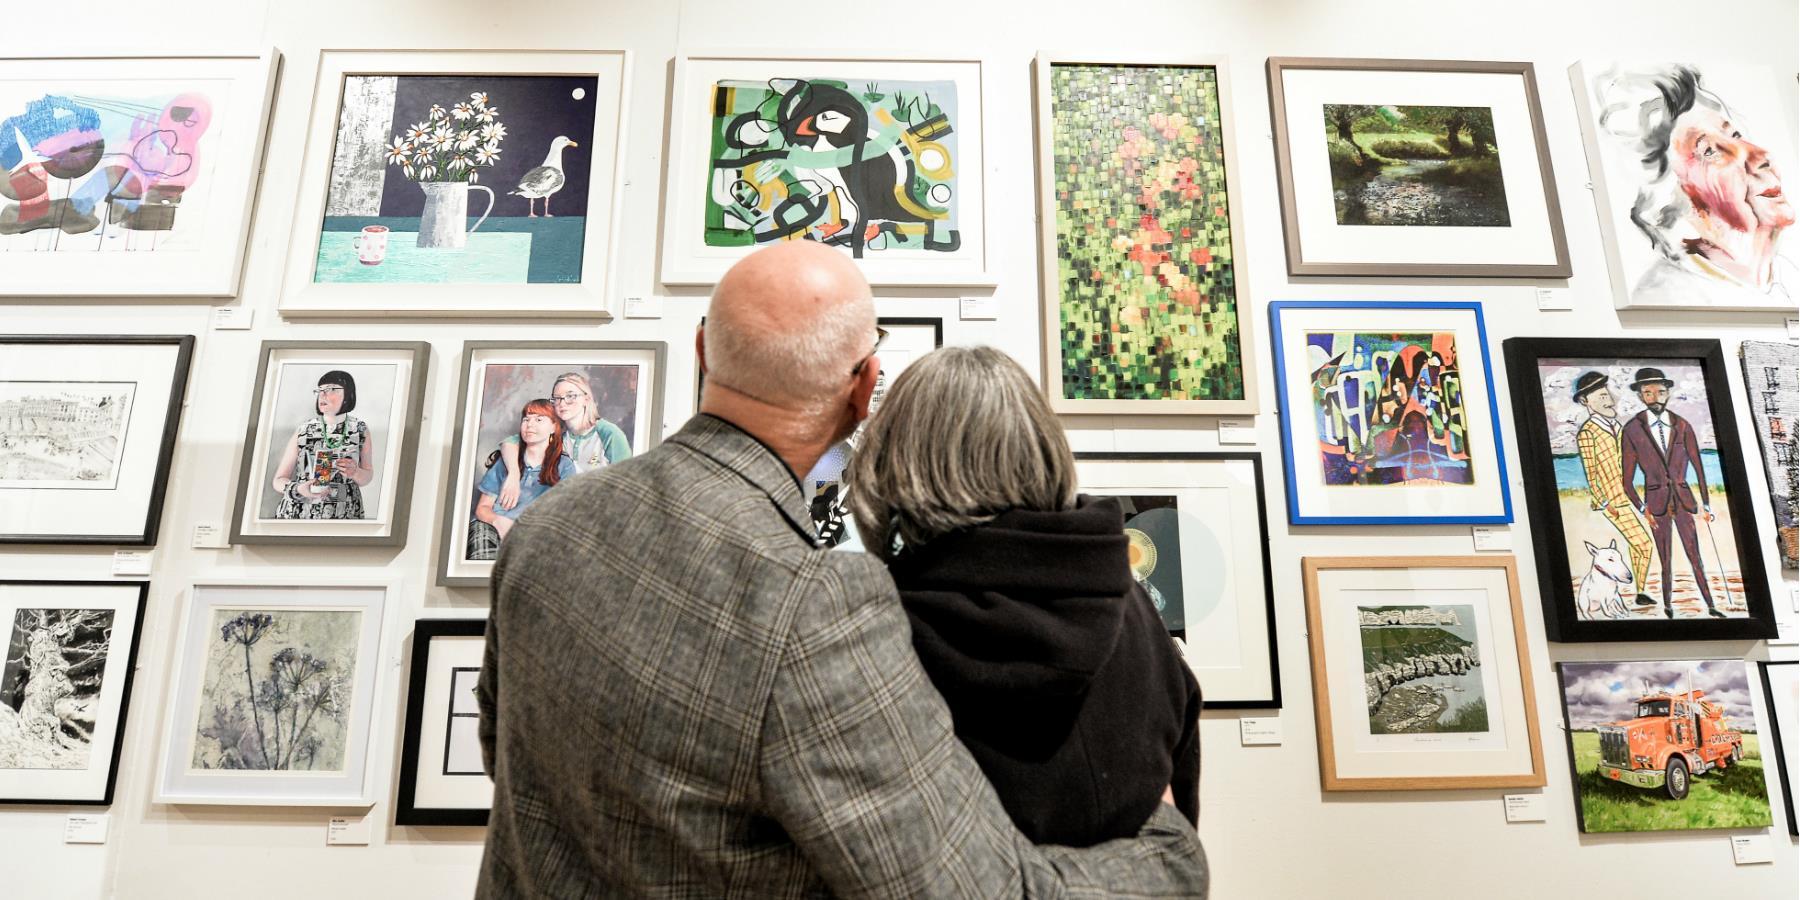 Couple enjoying the open exhibition